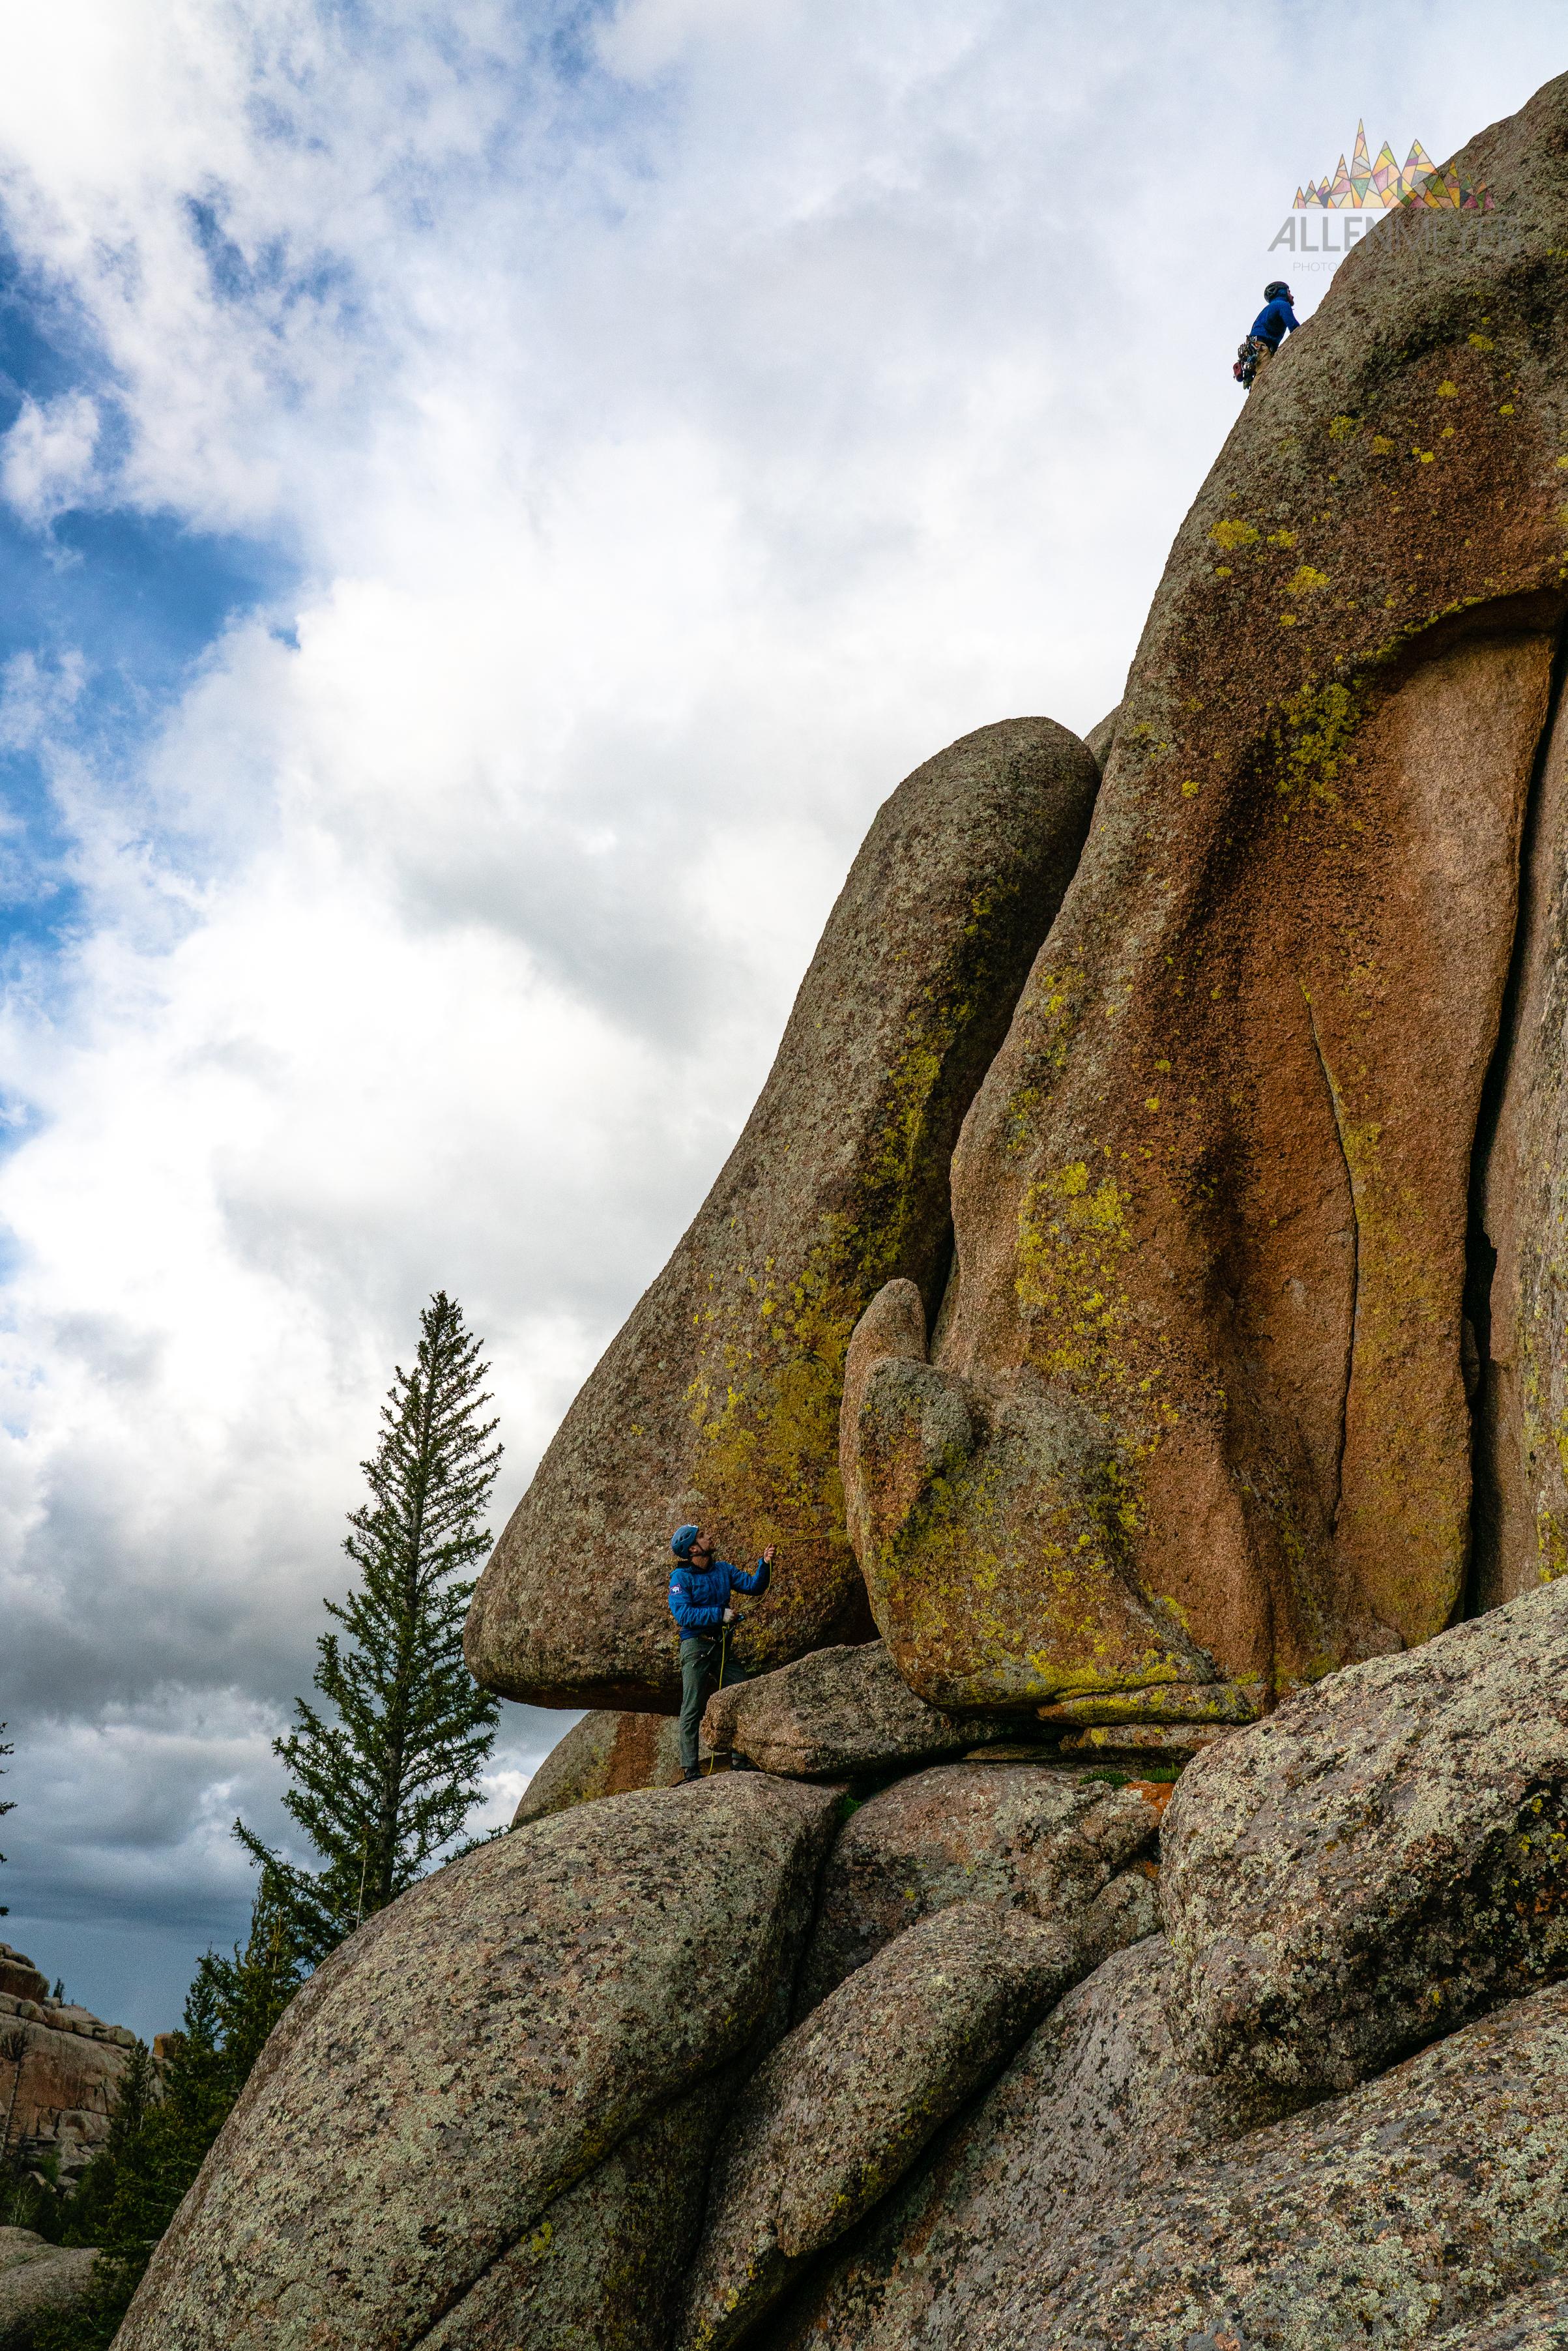 Outdoor Adventures In Cheyenne, Wyoming; Photography by Allen Meyer-05474.jpg